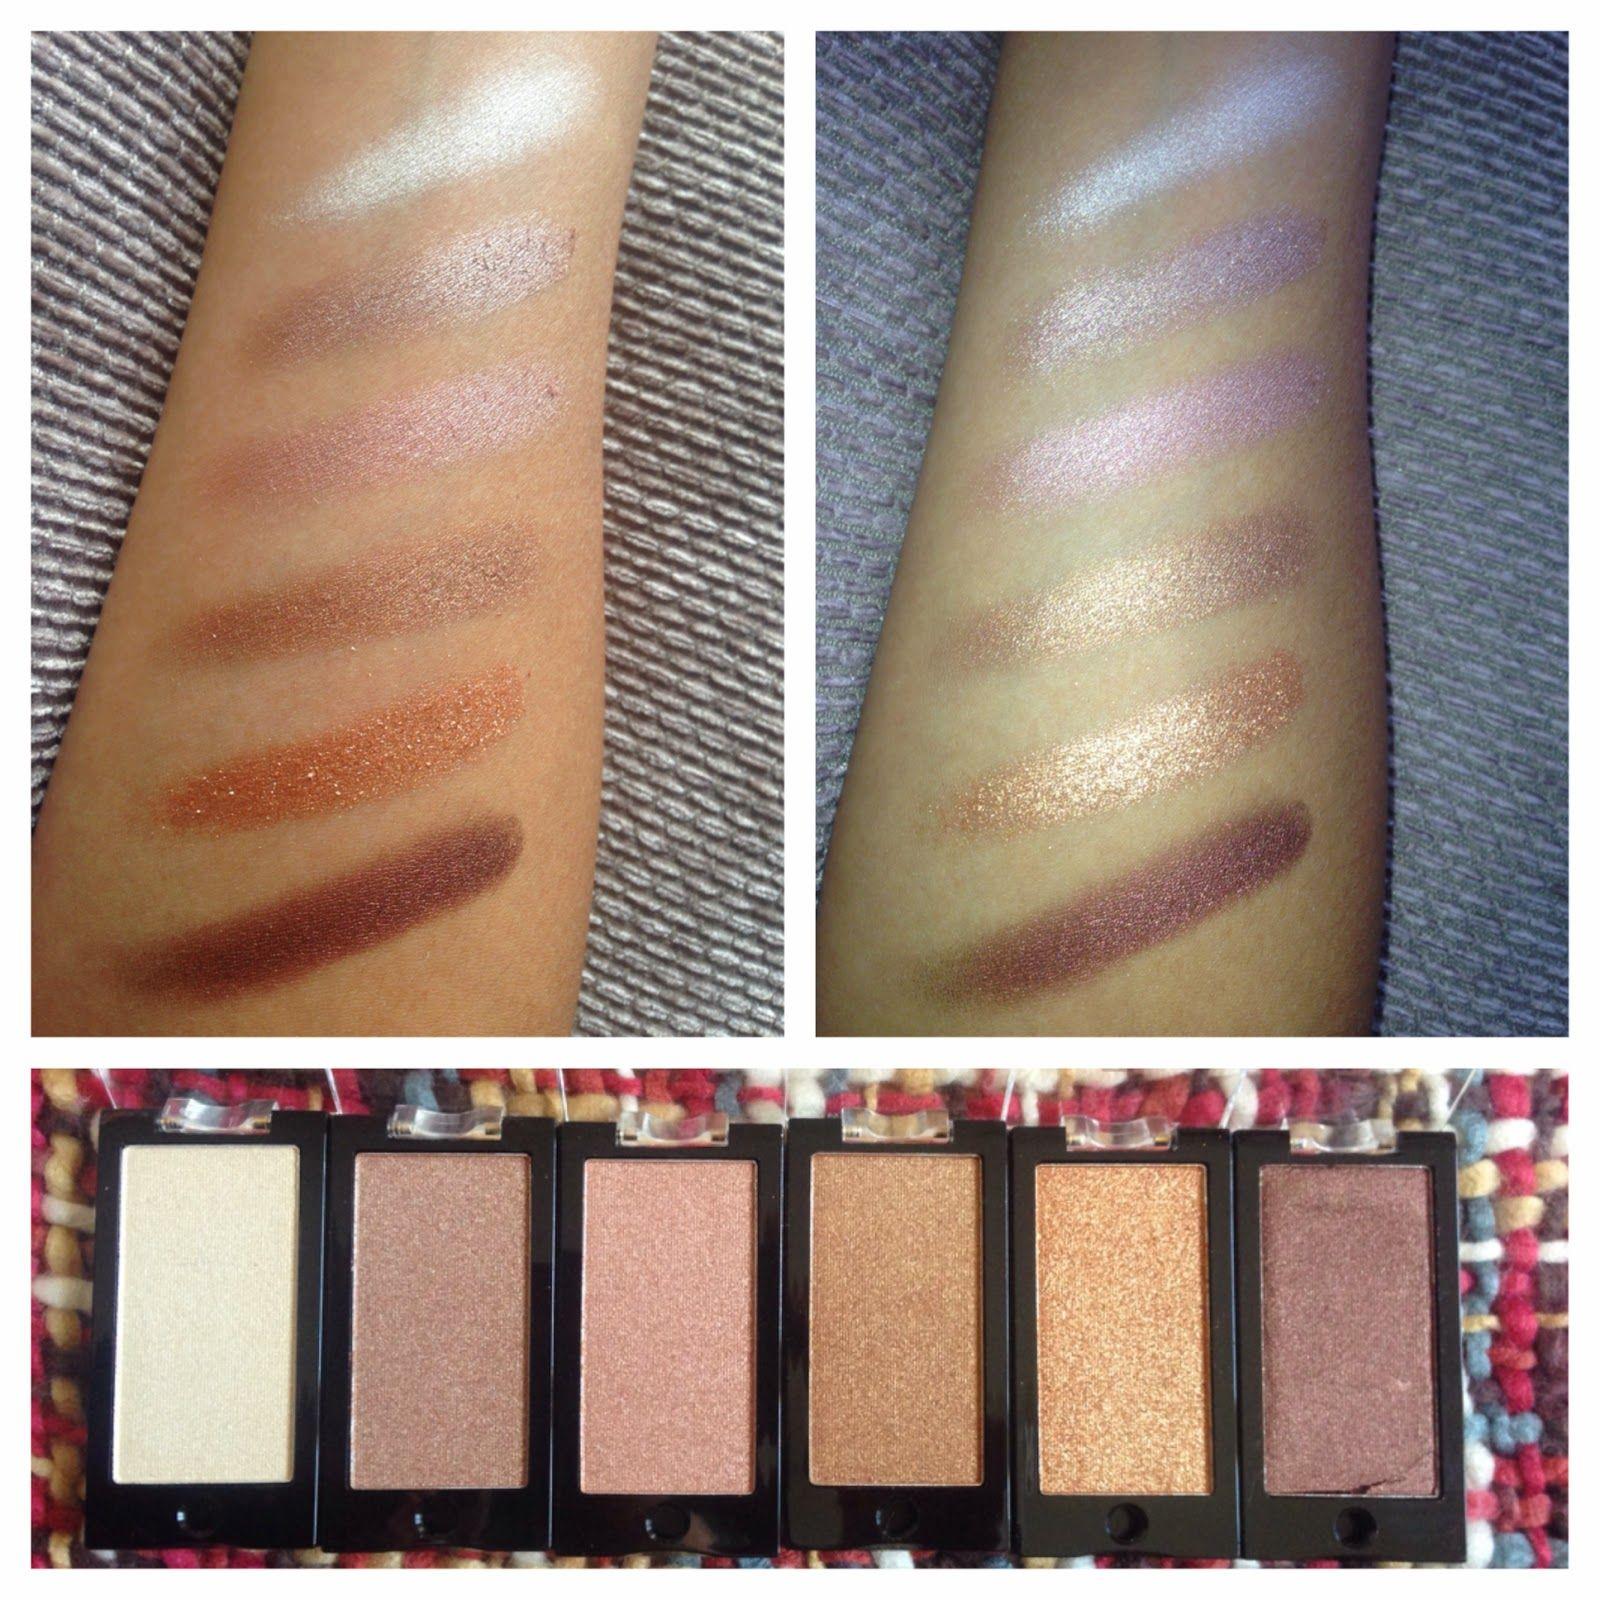 Cream Blush Palette by Revolution Beauty #20